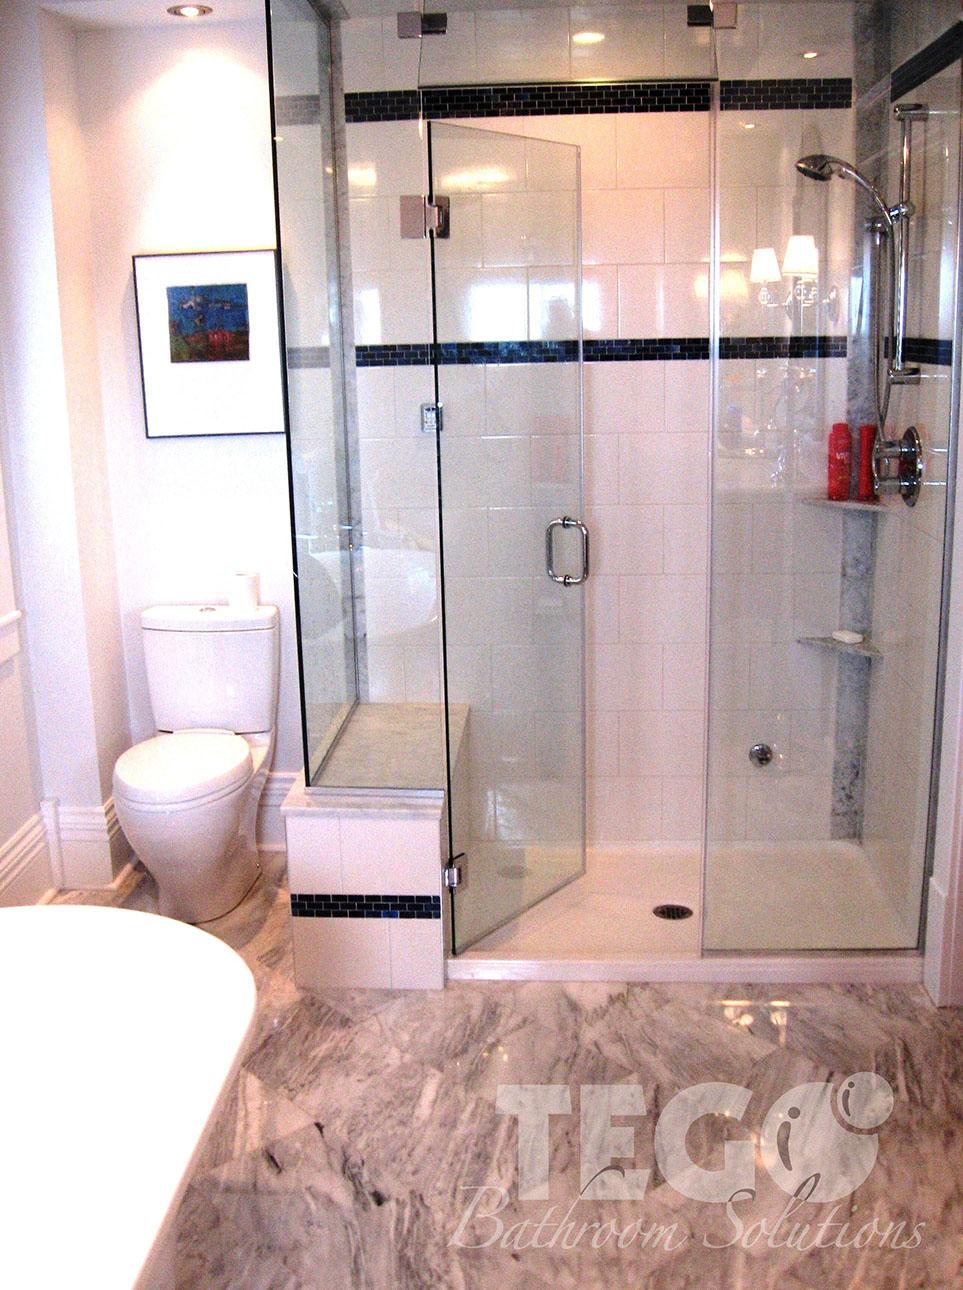 Bathroom 17 Tego Bathroom Solutions